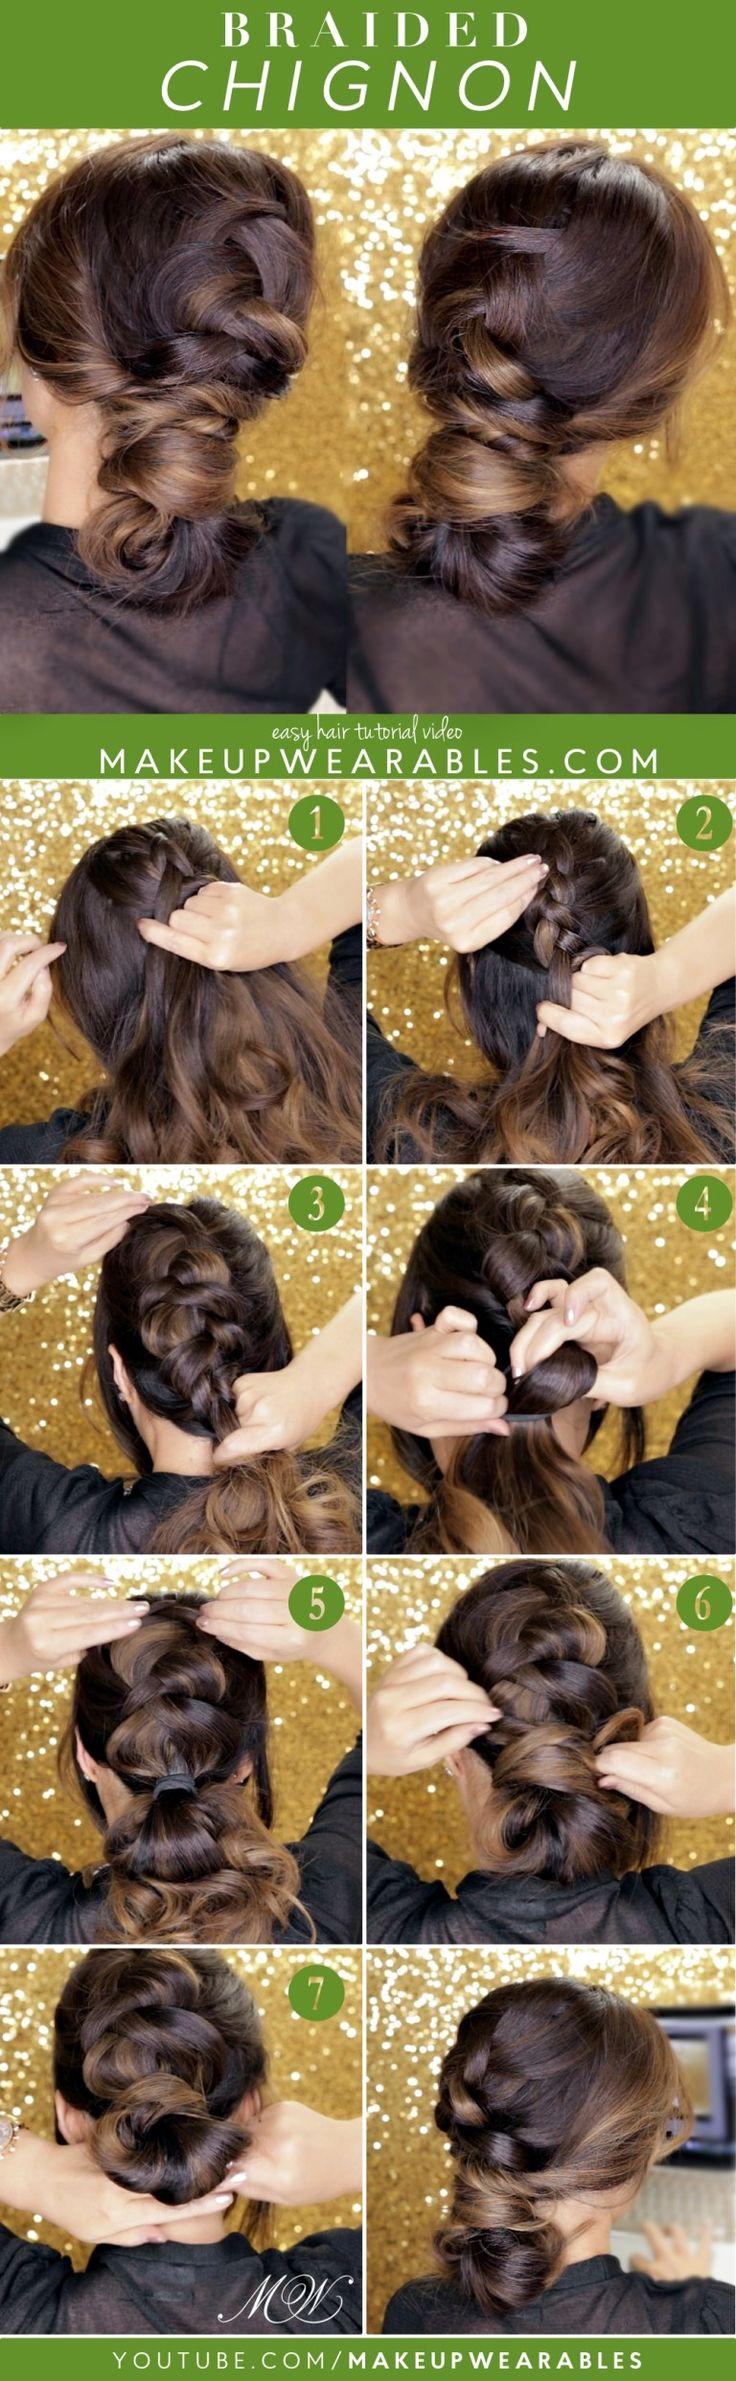 best bridal updo images on pinterest bridal hairstyles wedding